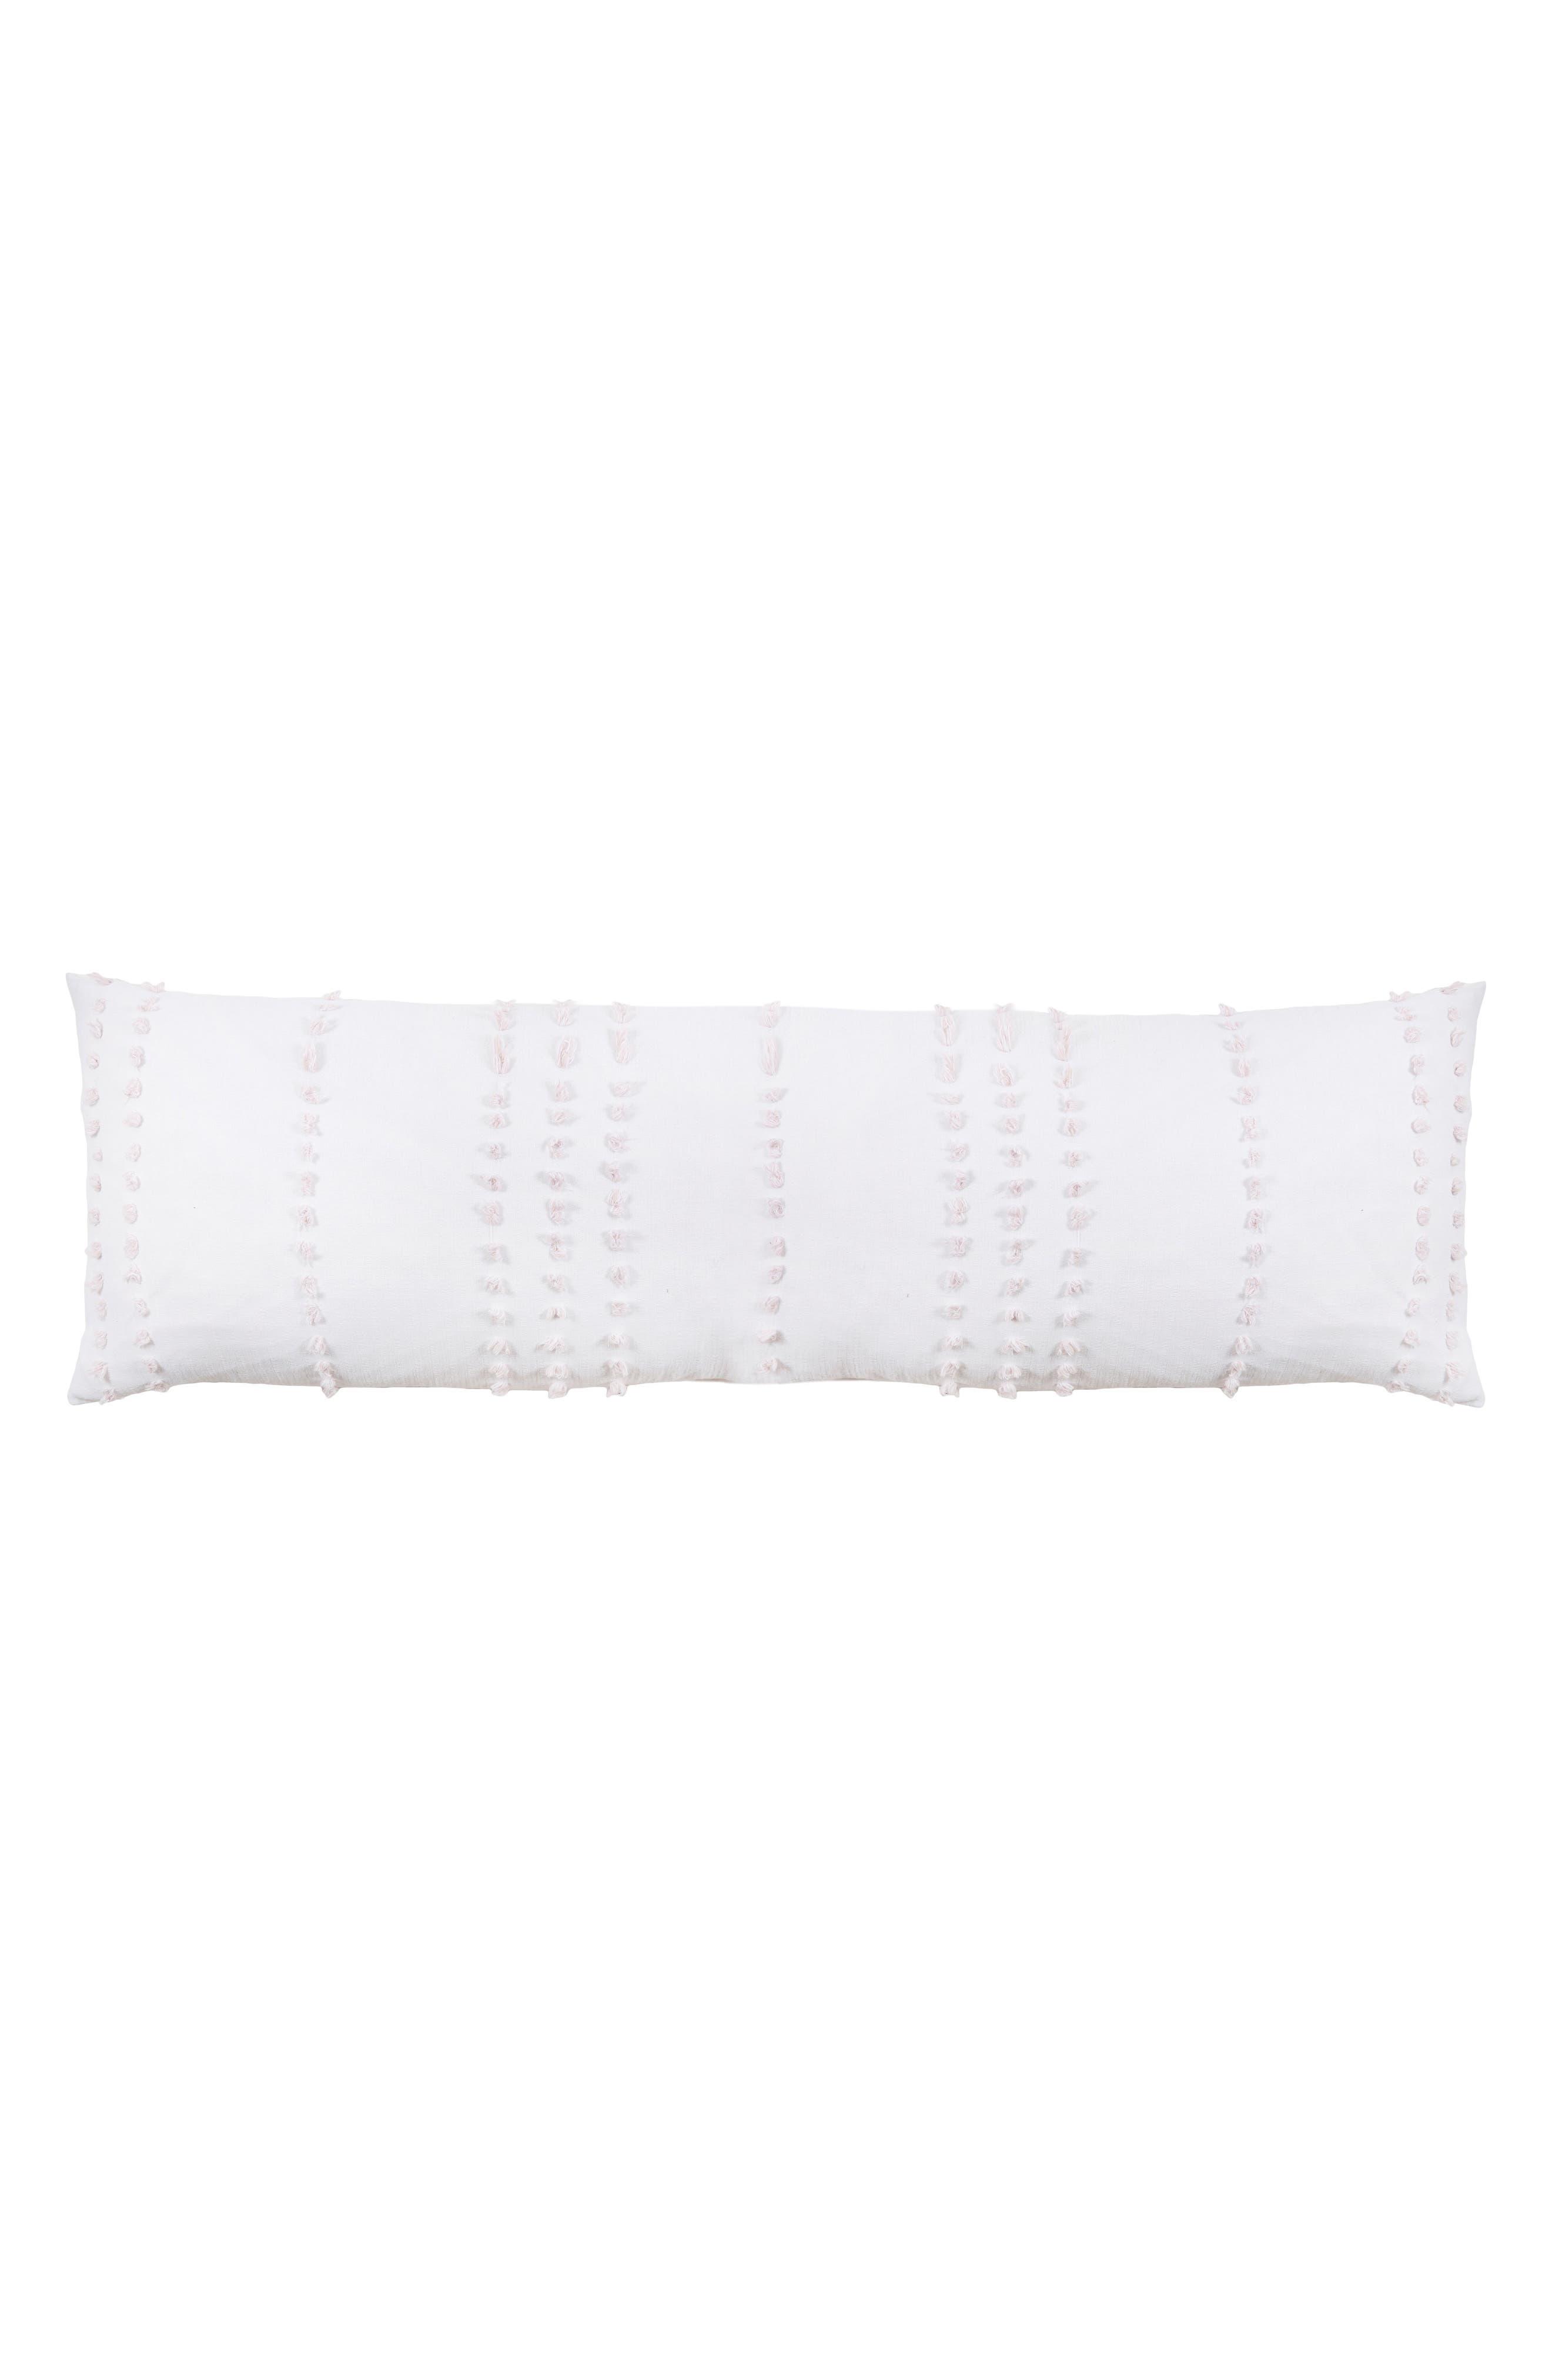 Poppy Body Pillow,                             Main thumbnail 1, color,                             WHITE/ BLUSH